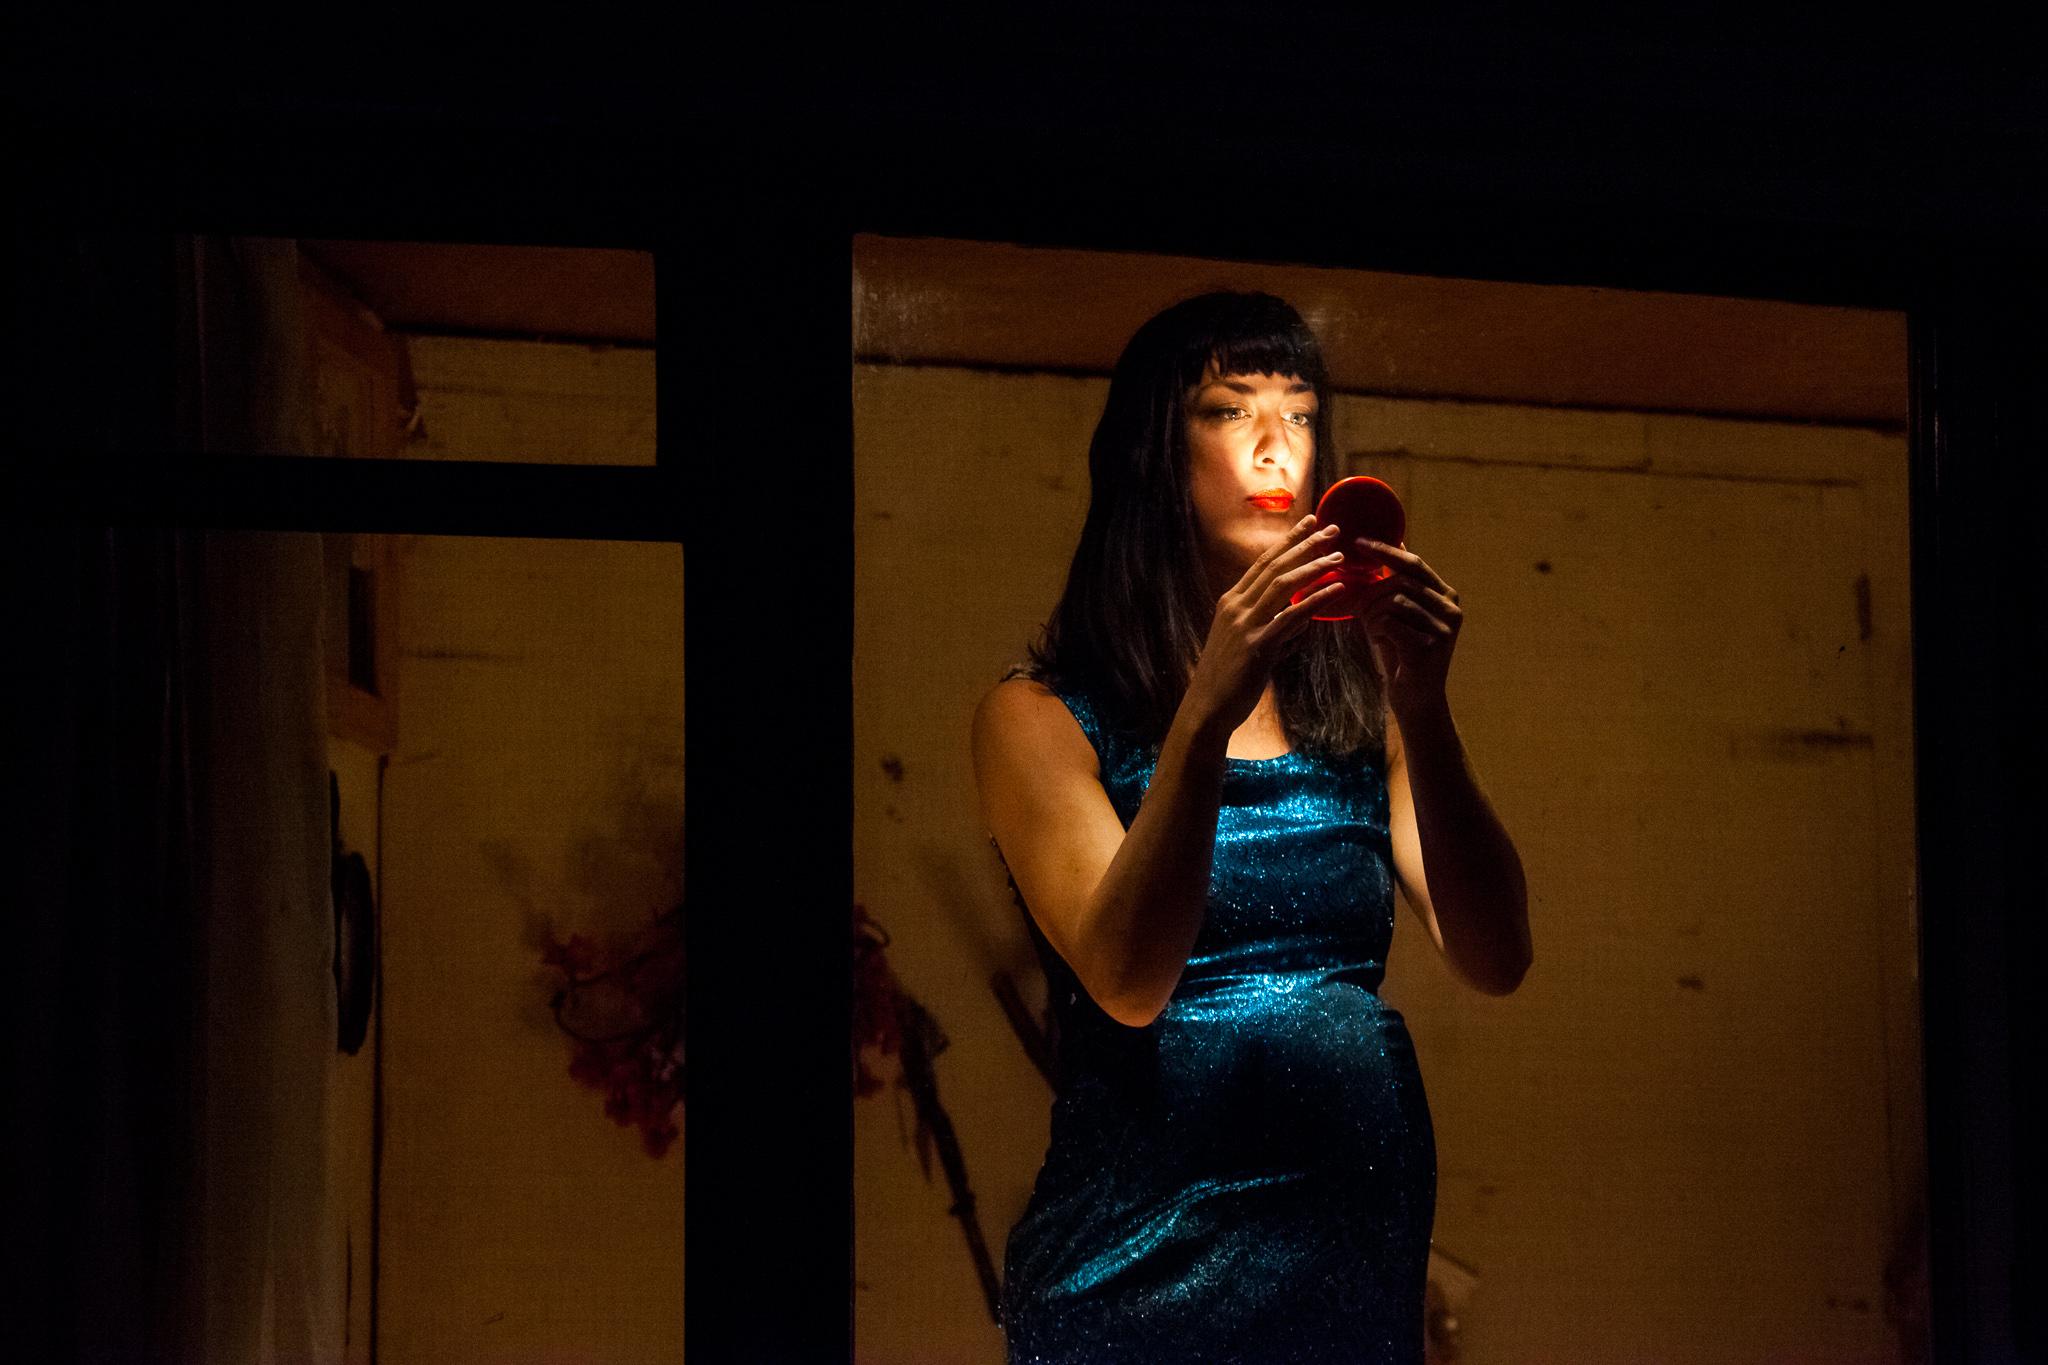 image of Peepingtom - 32 rue vandenbranden dance photography, fotografia de escena, fotografo de danza, dance photographer, stage photography